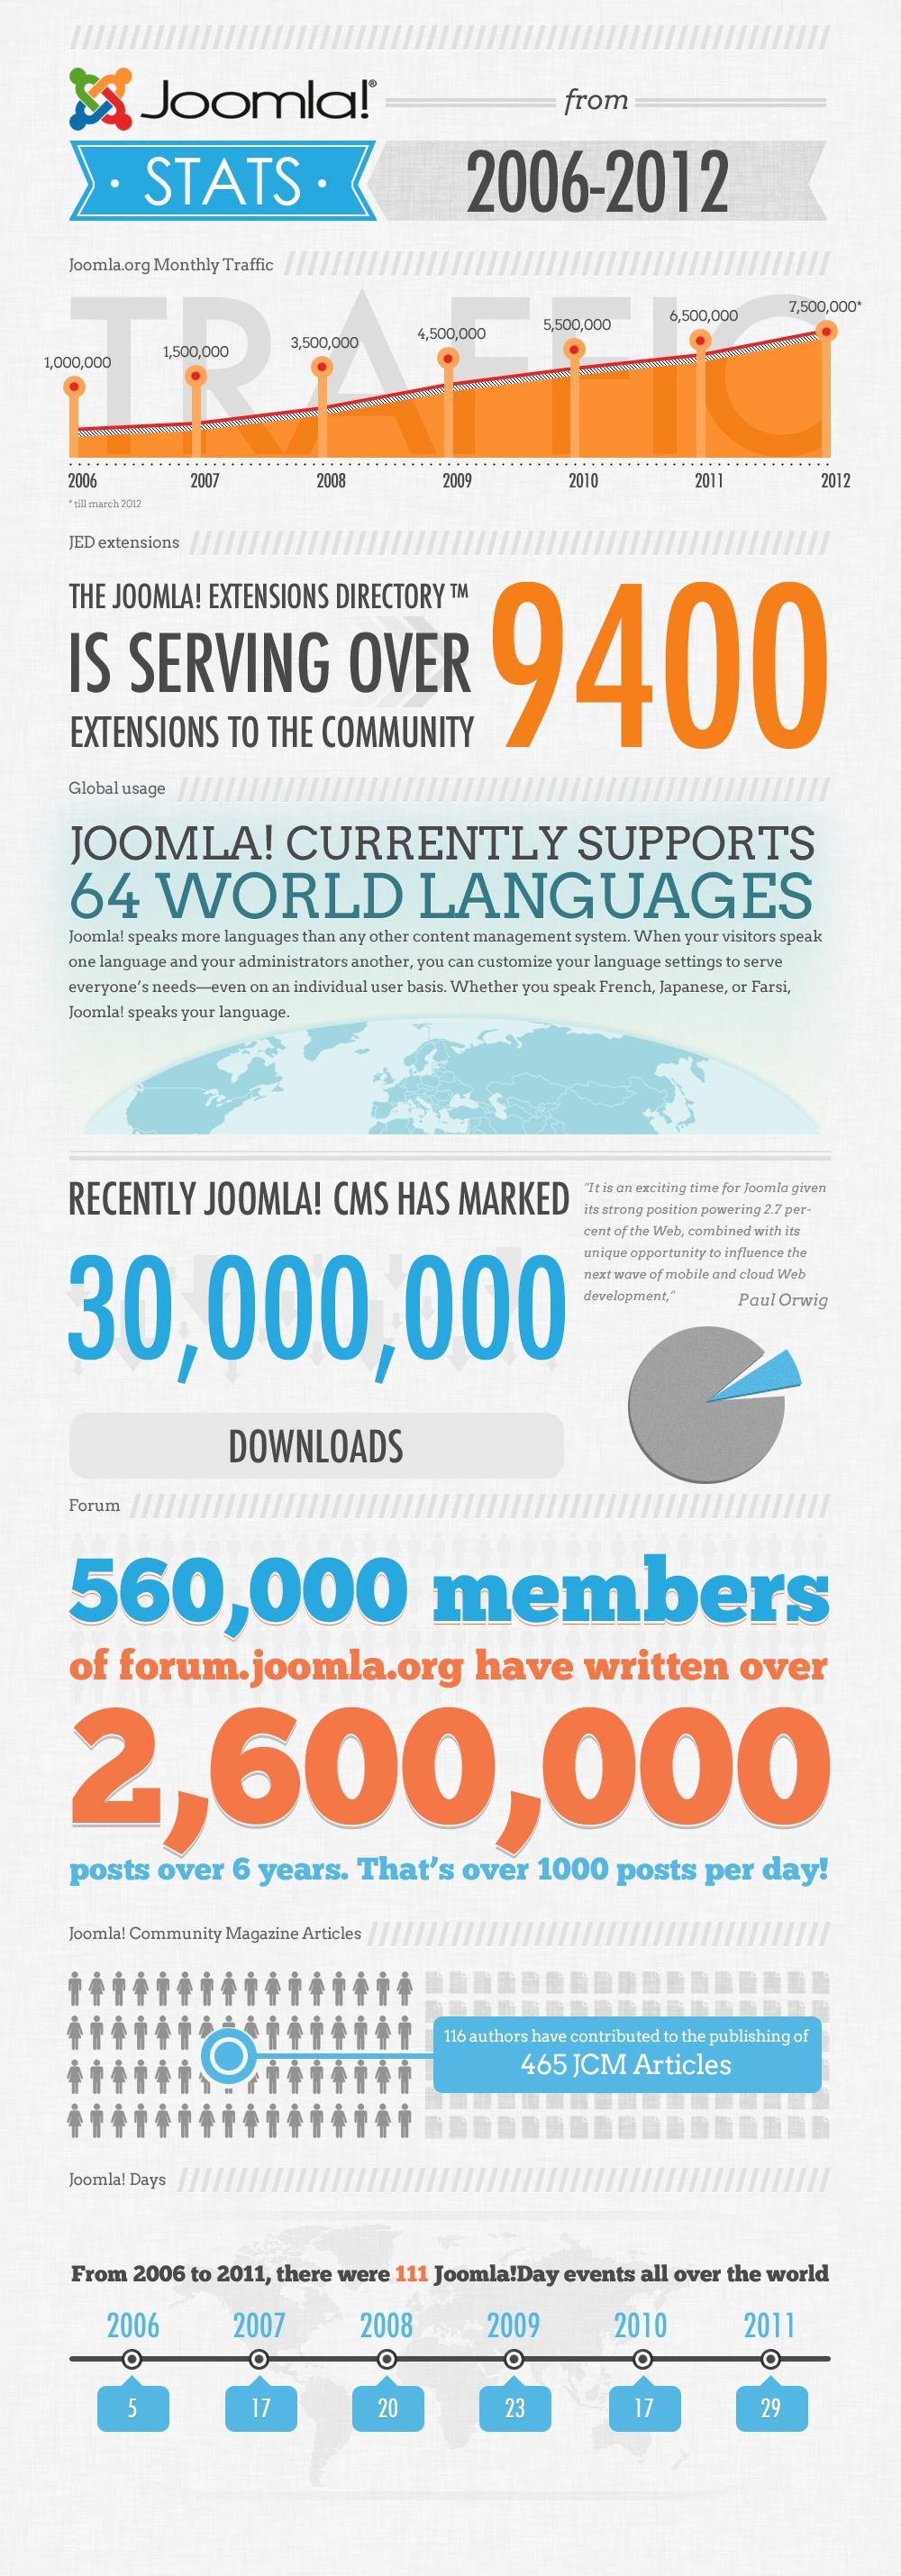 Joomla-Stats-2006-2012-Infographic